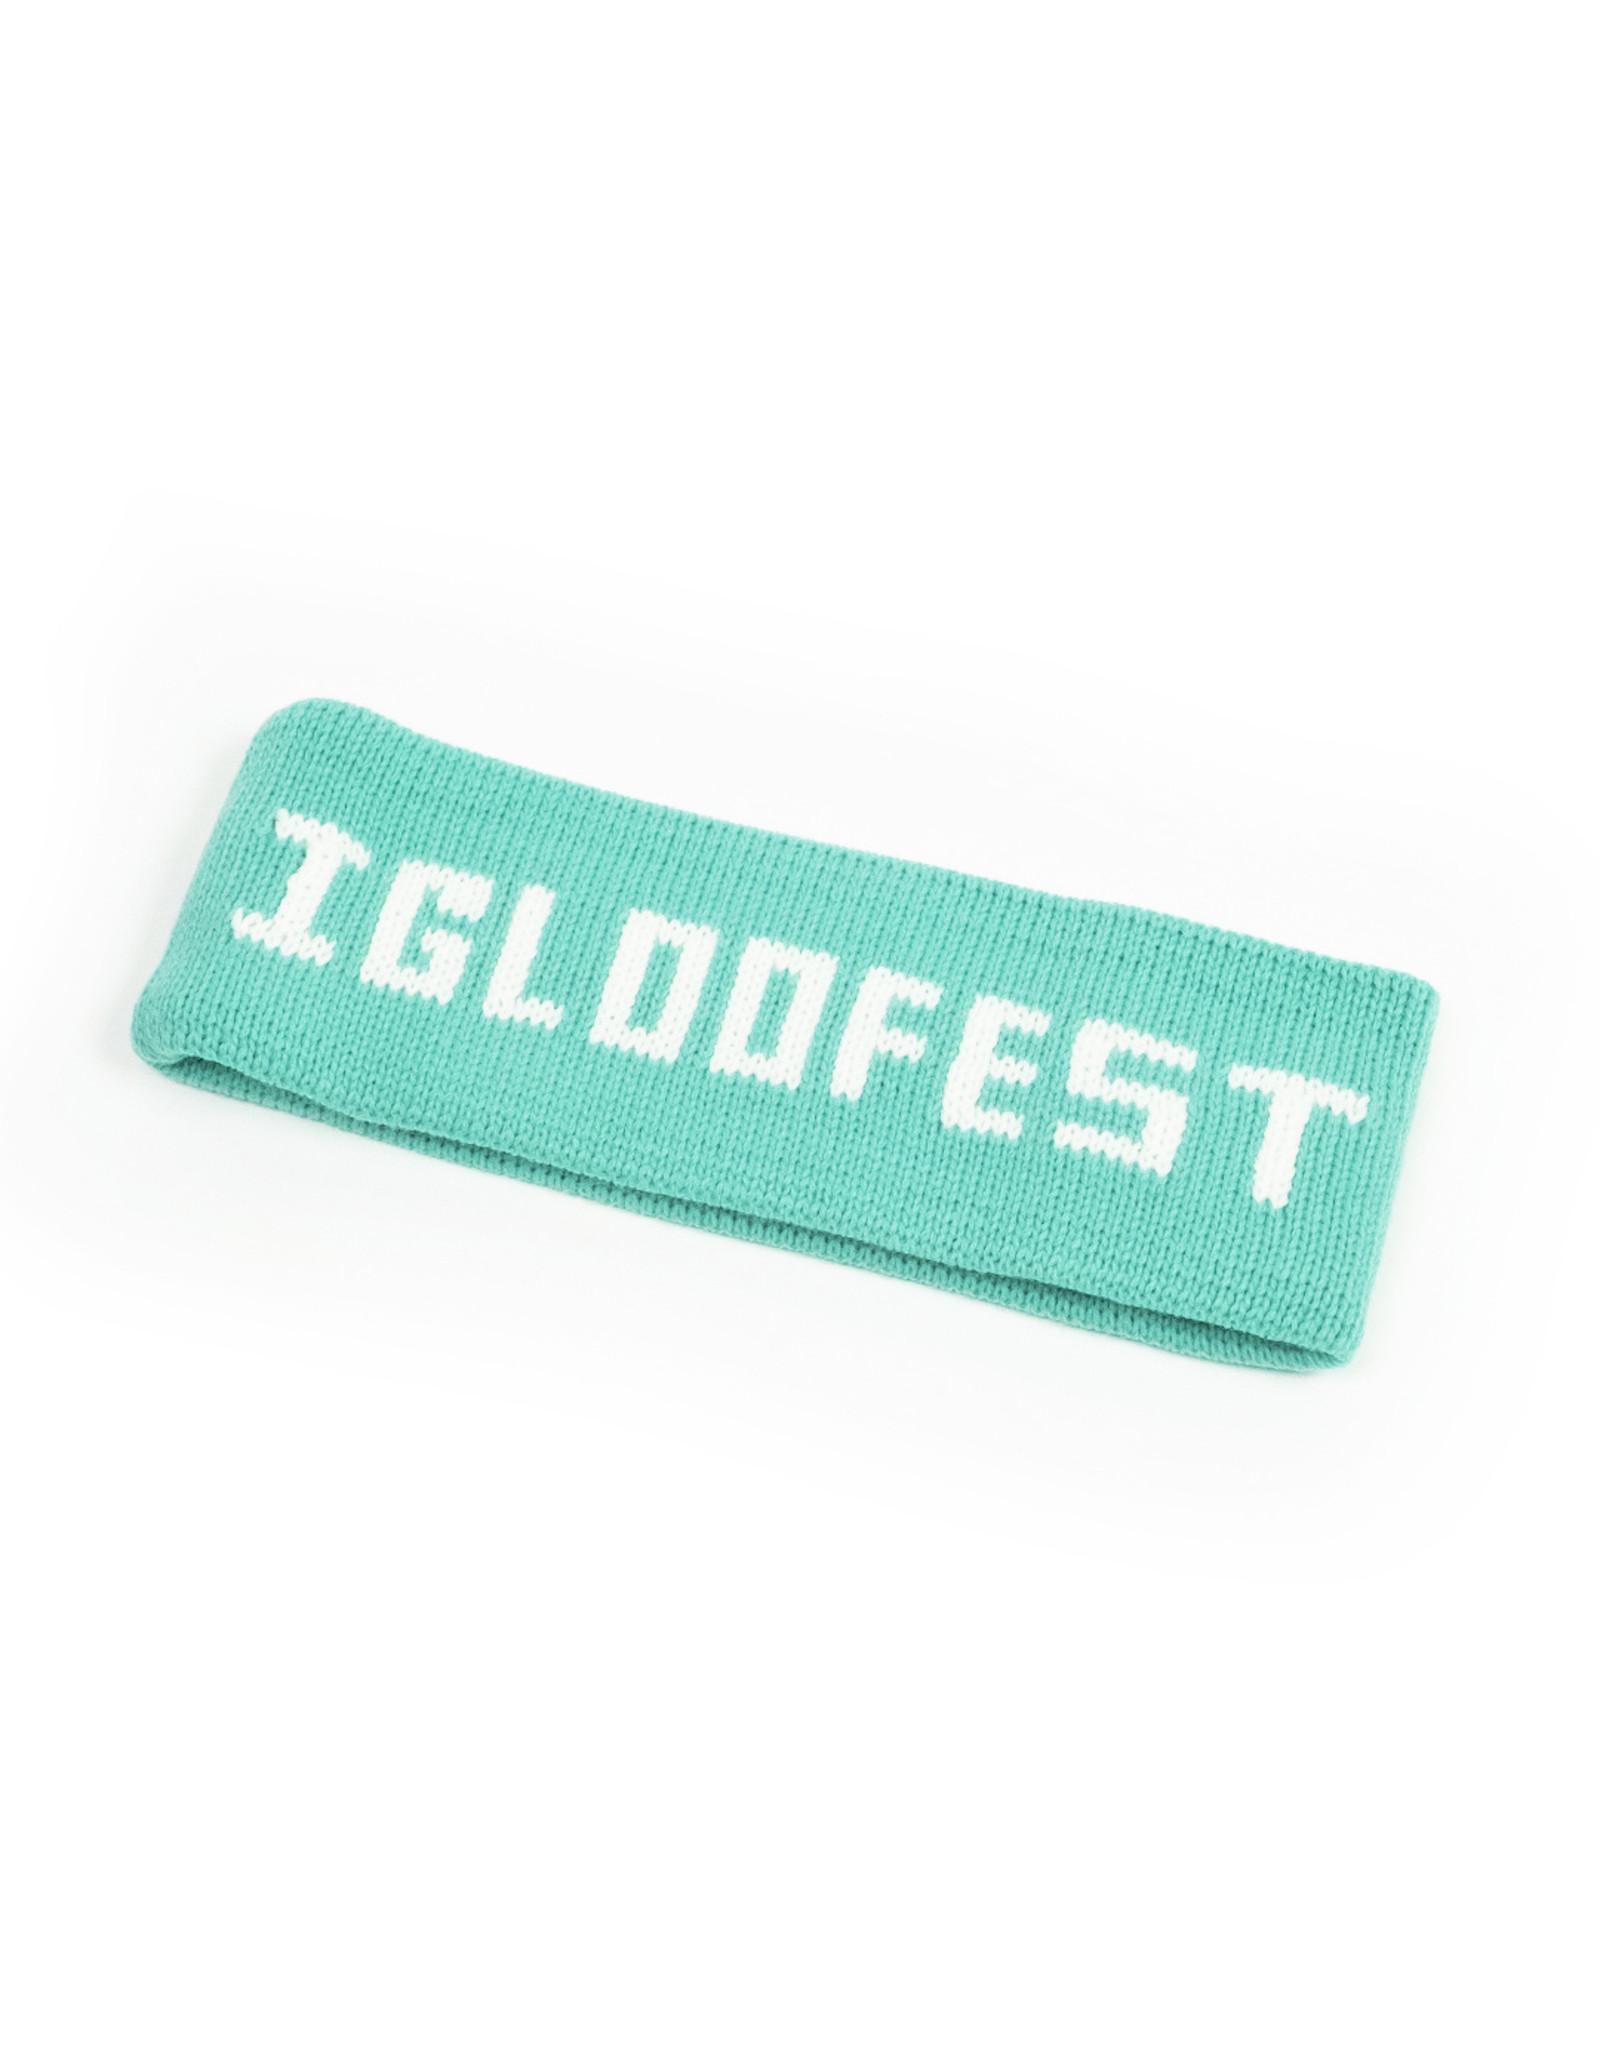 Turquoise Headband | 2020 Collection